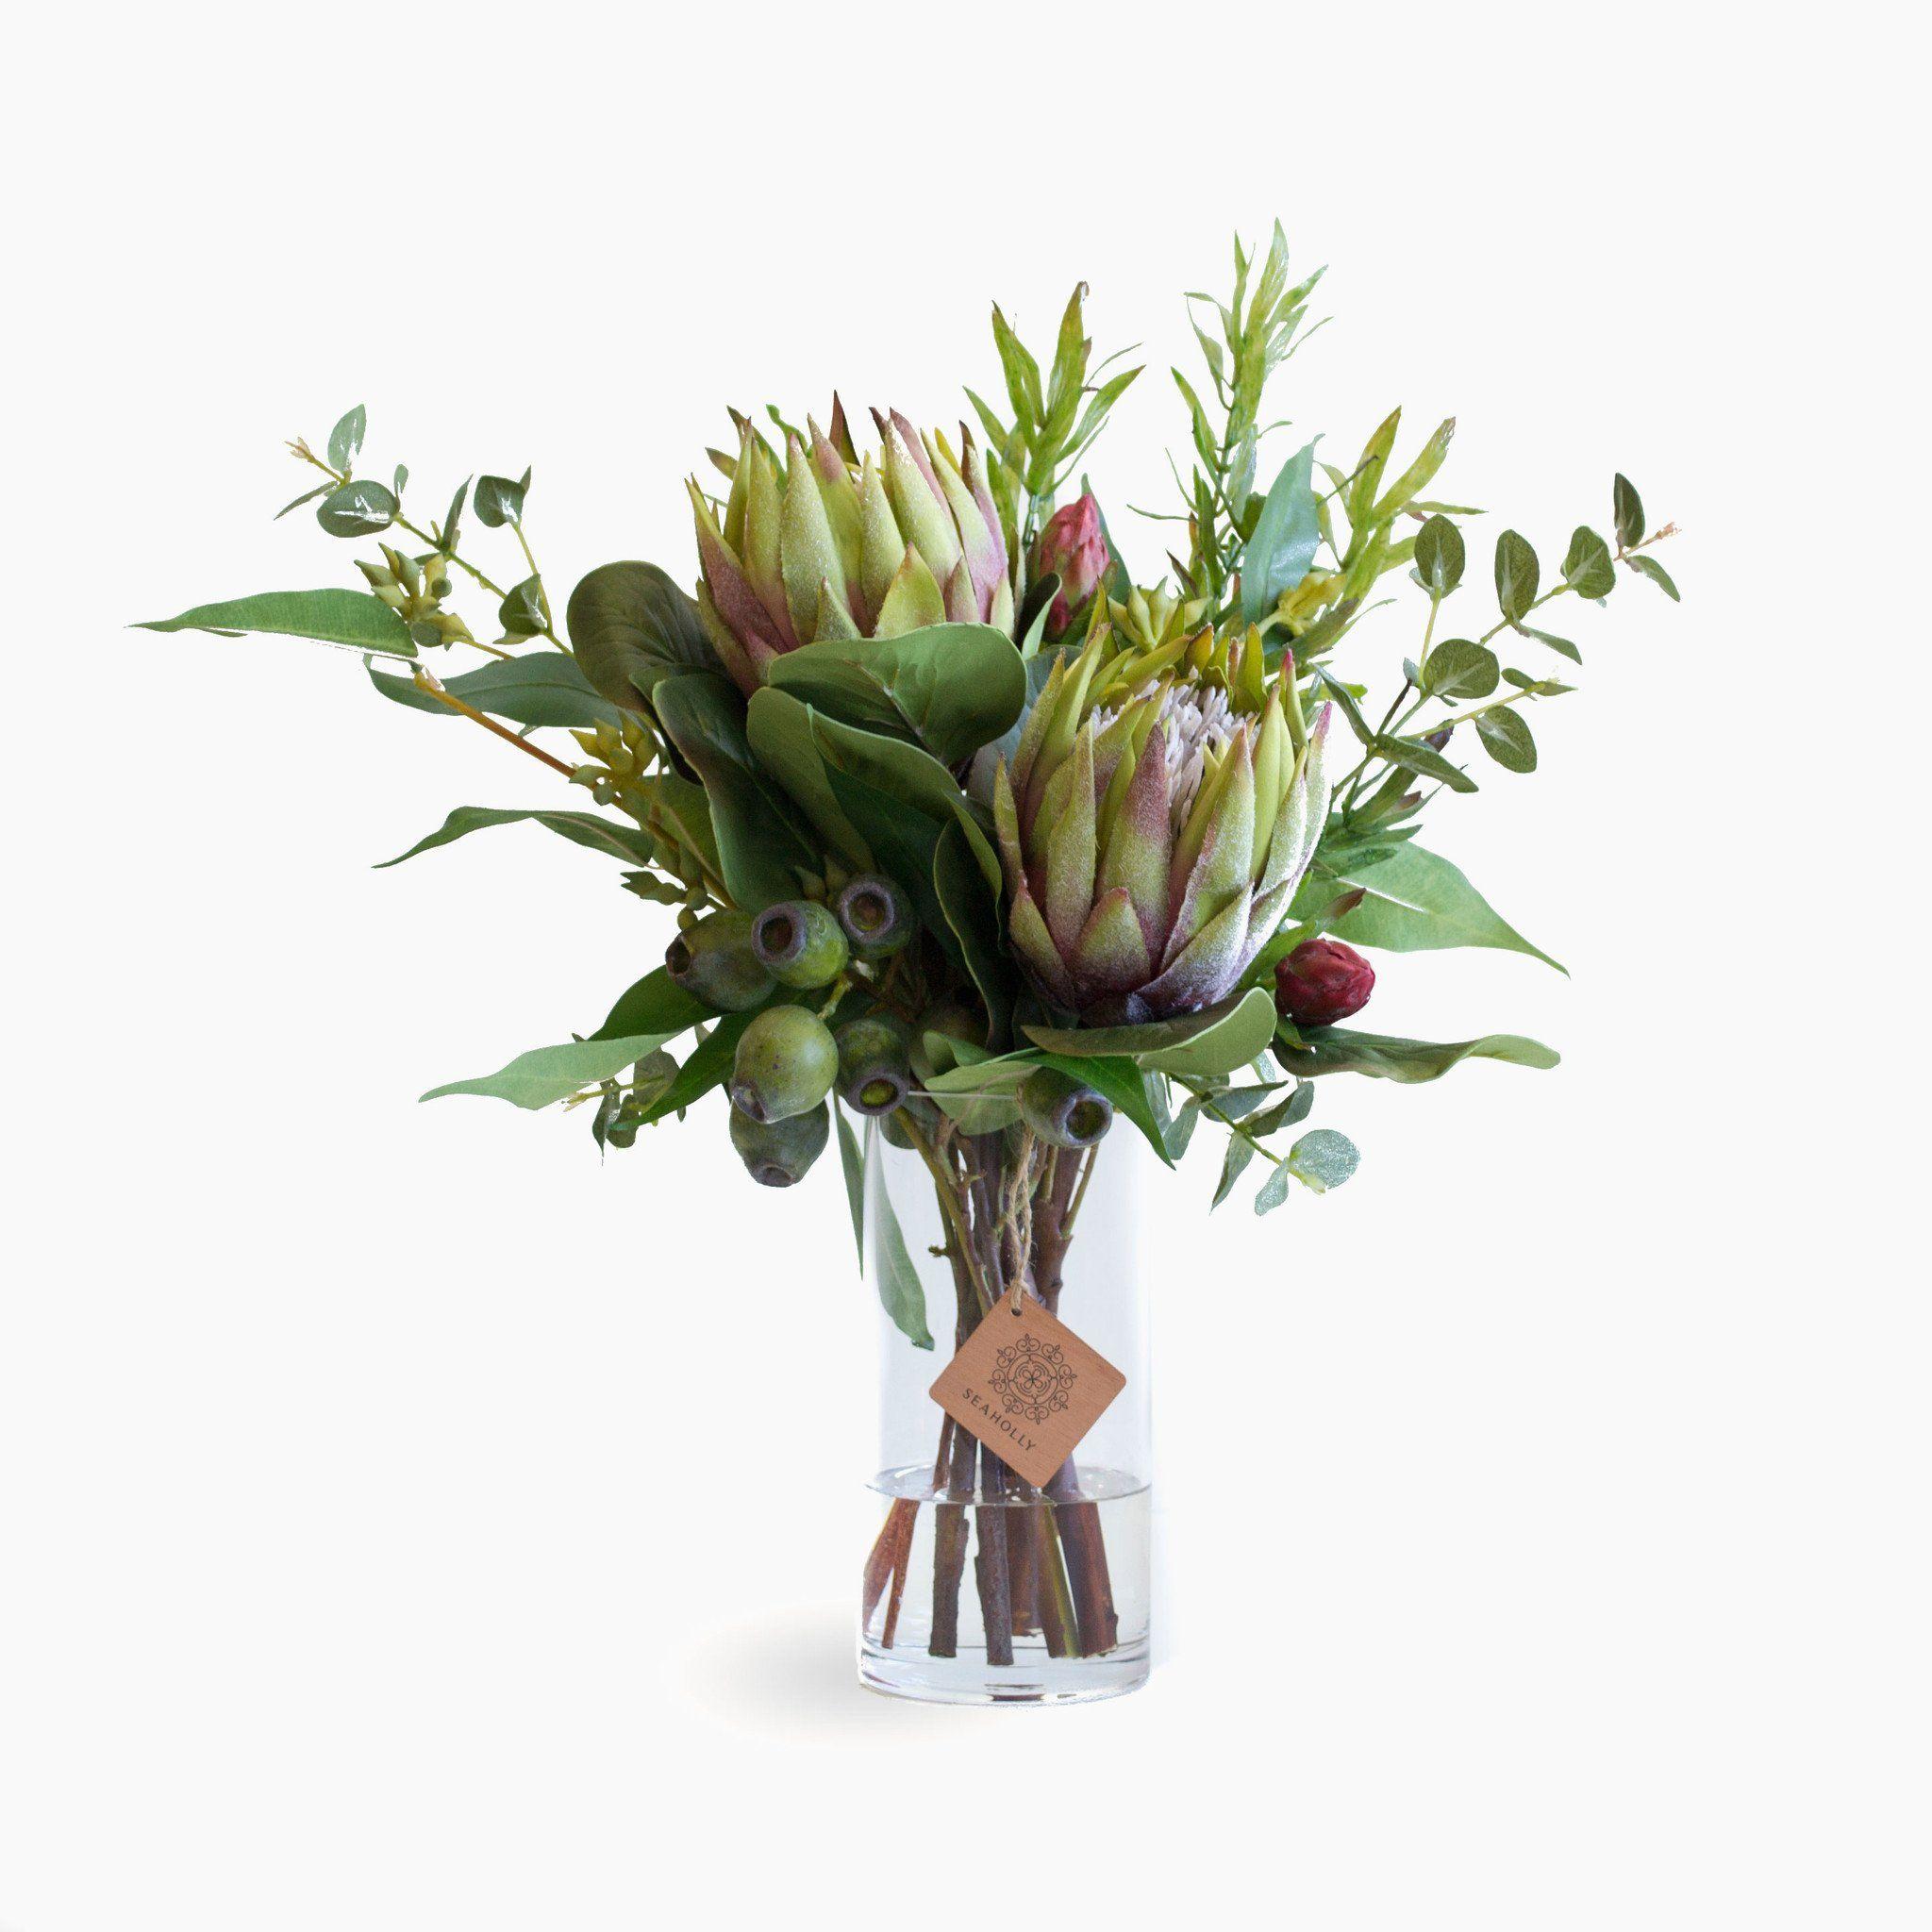 Green Protea And Leucadendron Fake Flower Arrangements Artificial Flower Arrangements Artificial Flowers Wedding